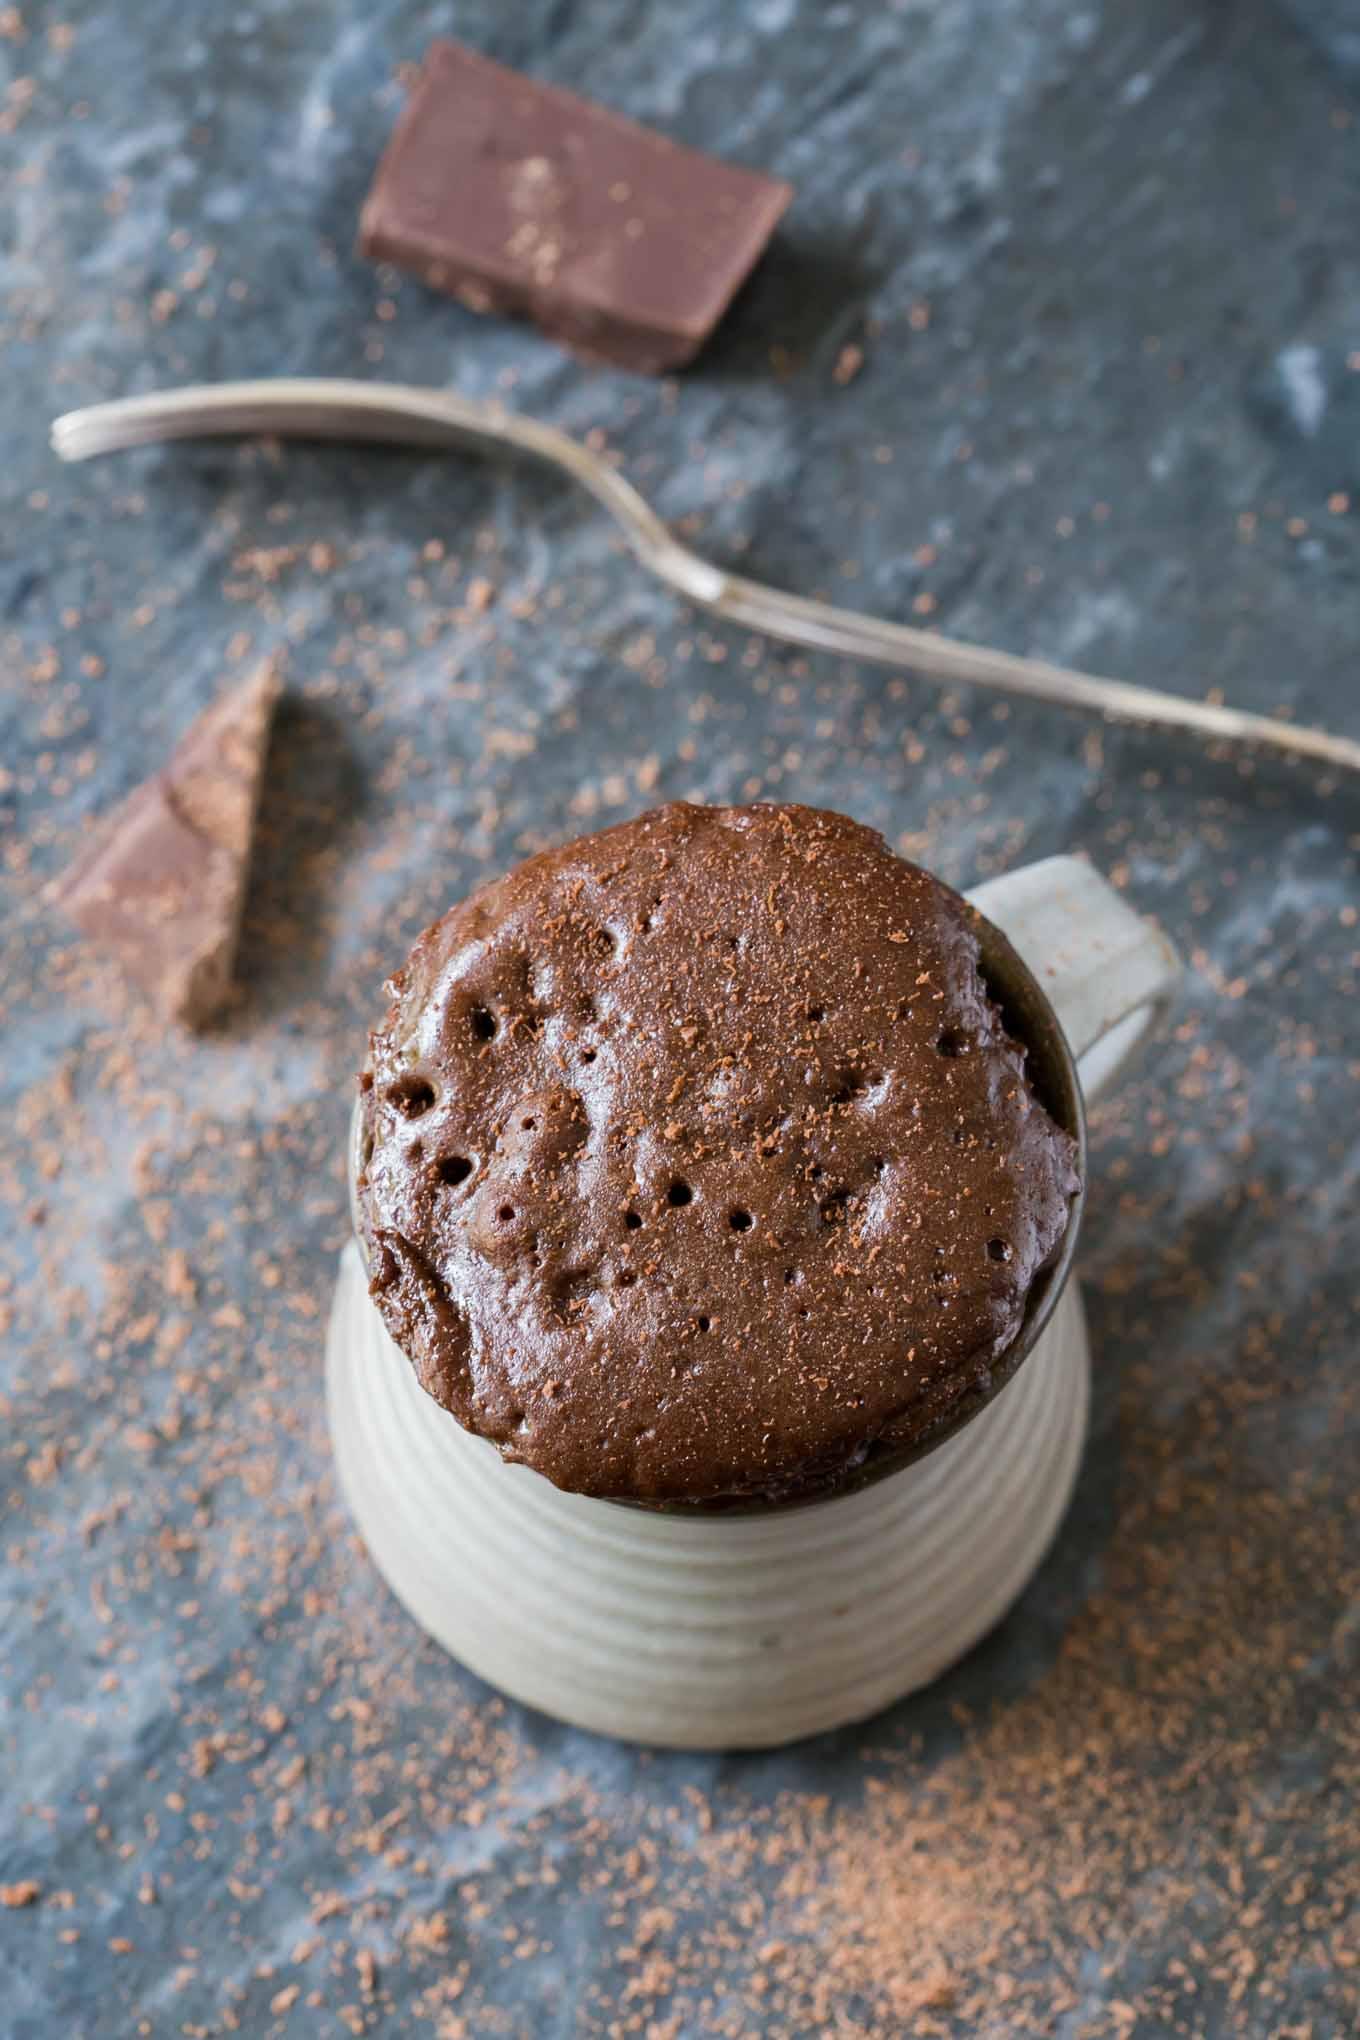 CHOCOLATE CAKE IN A MUG | GARLIC MATTERS